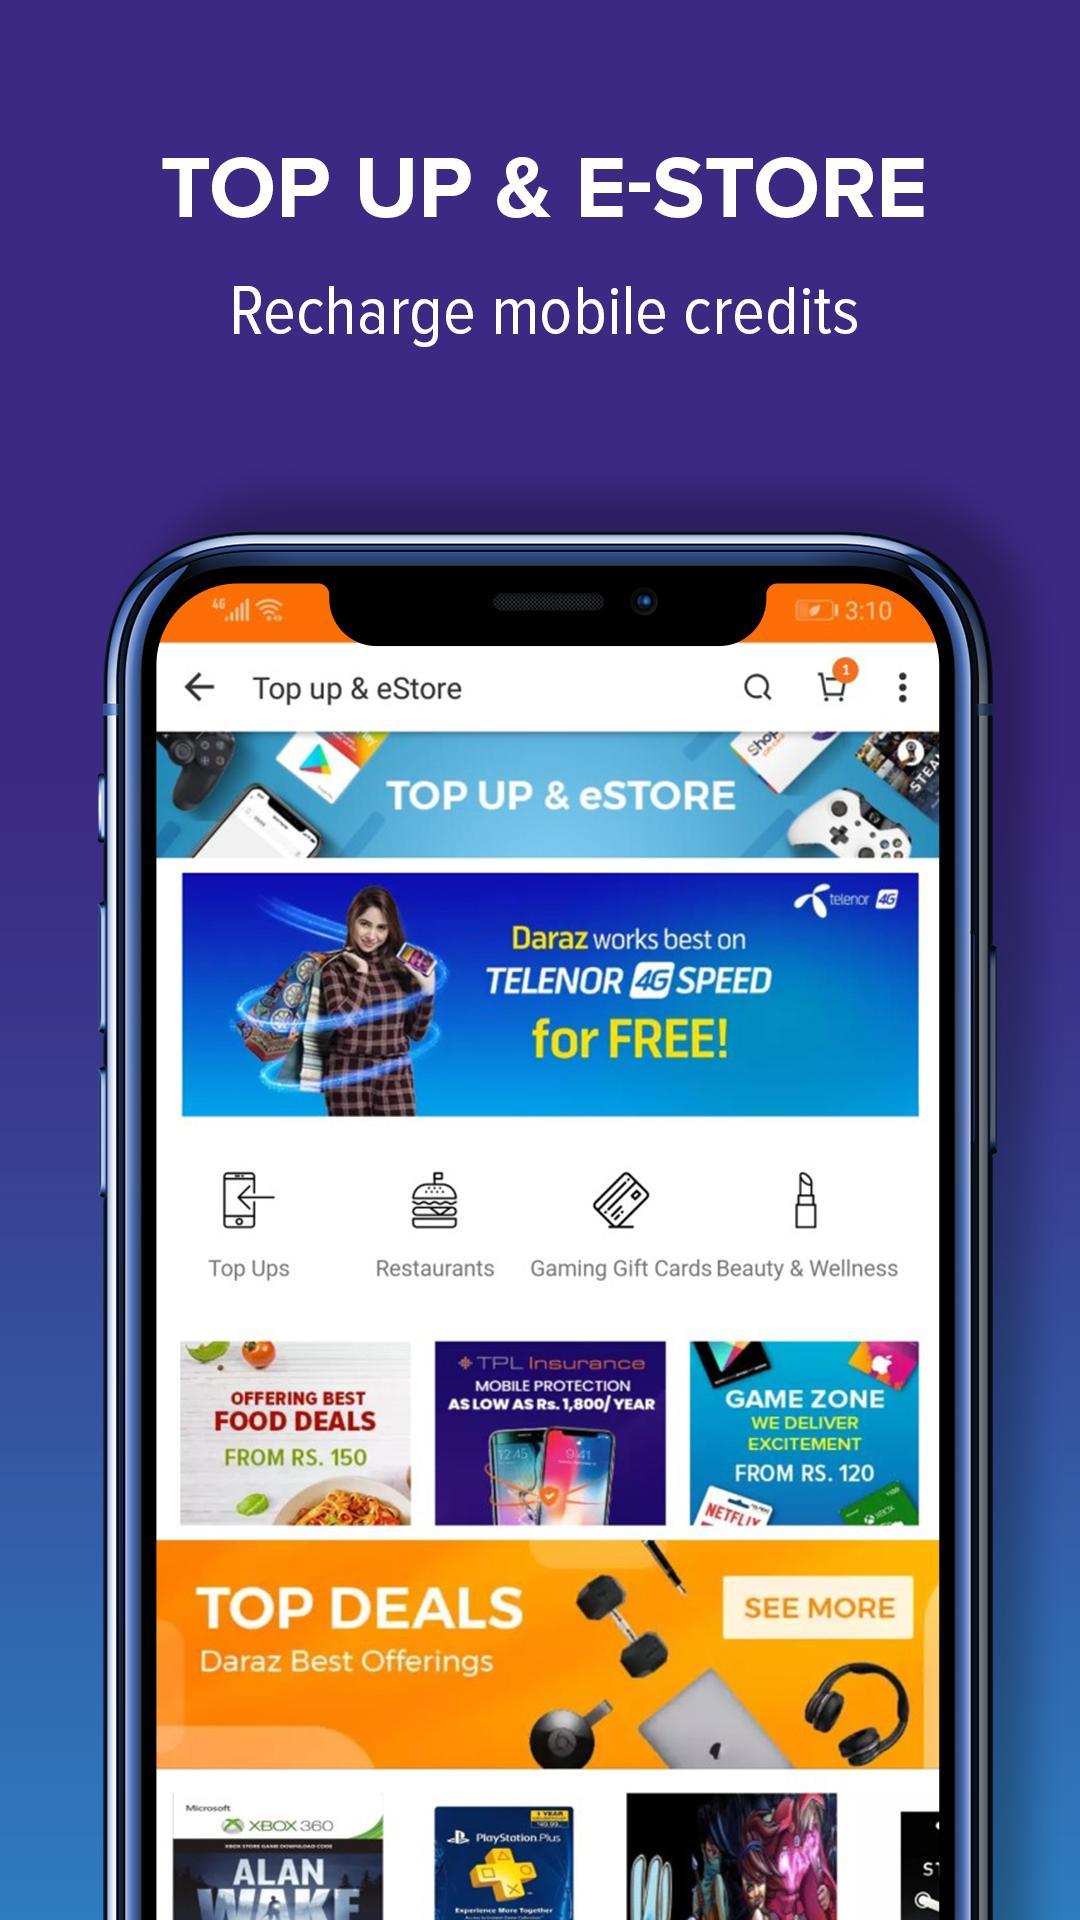 Daraz Online Shopping App APK 4.9.4 Download for Android – Download Daraz Online Shopping App